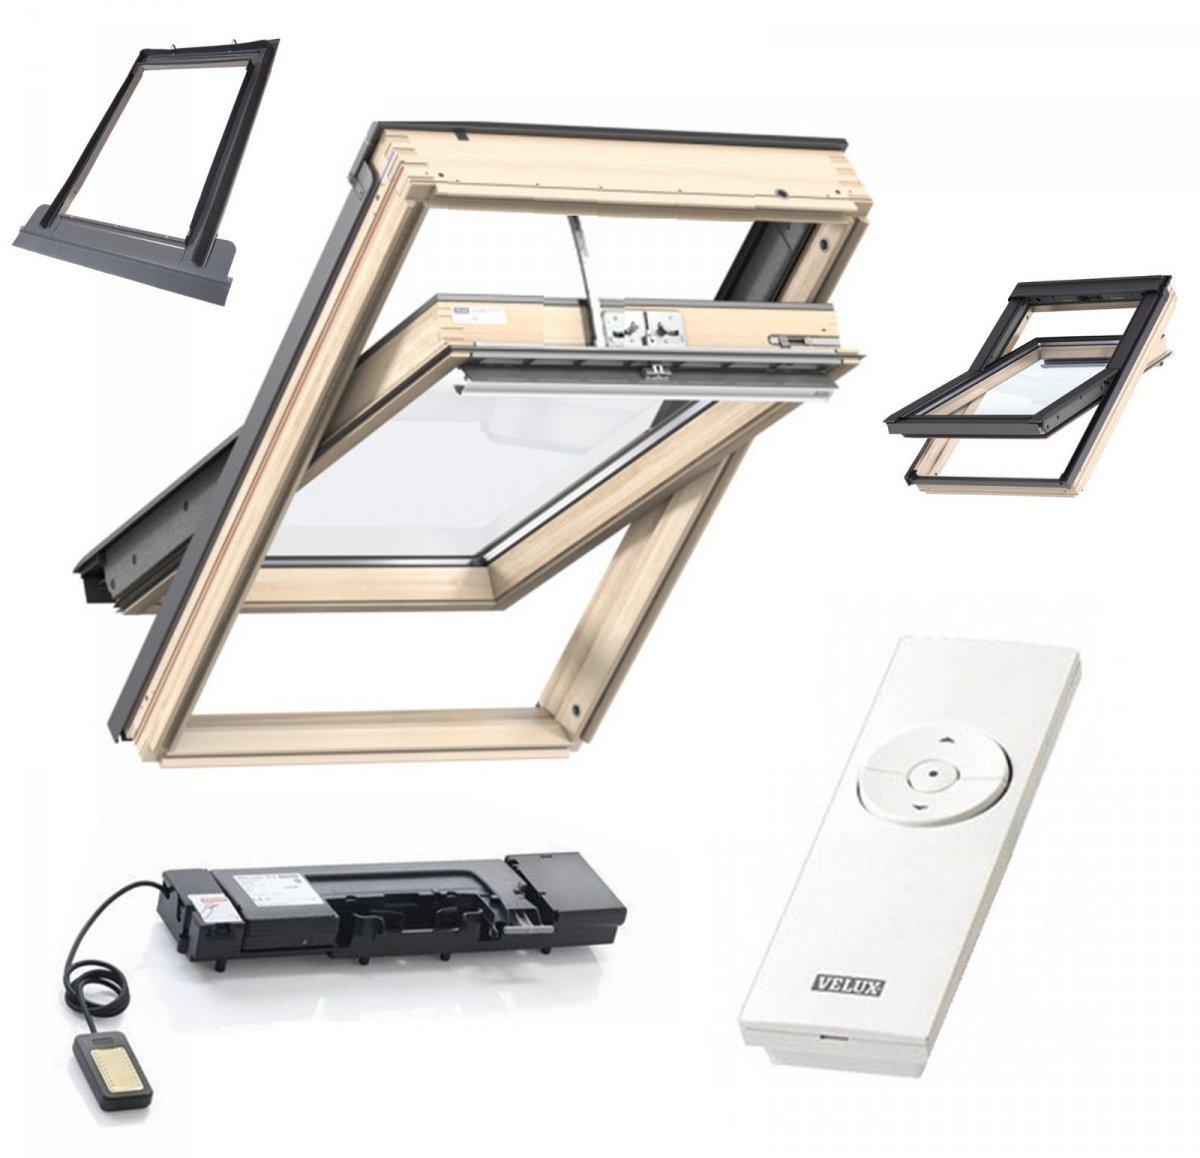 automatishe dachfenster set velux gzl 1051 2 fach. Black Bedroom Furniture Sets. Home Design Ideas